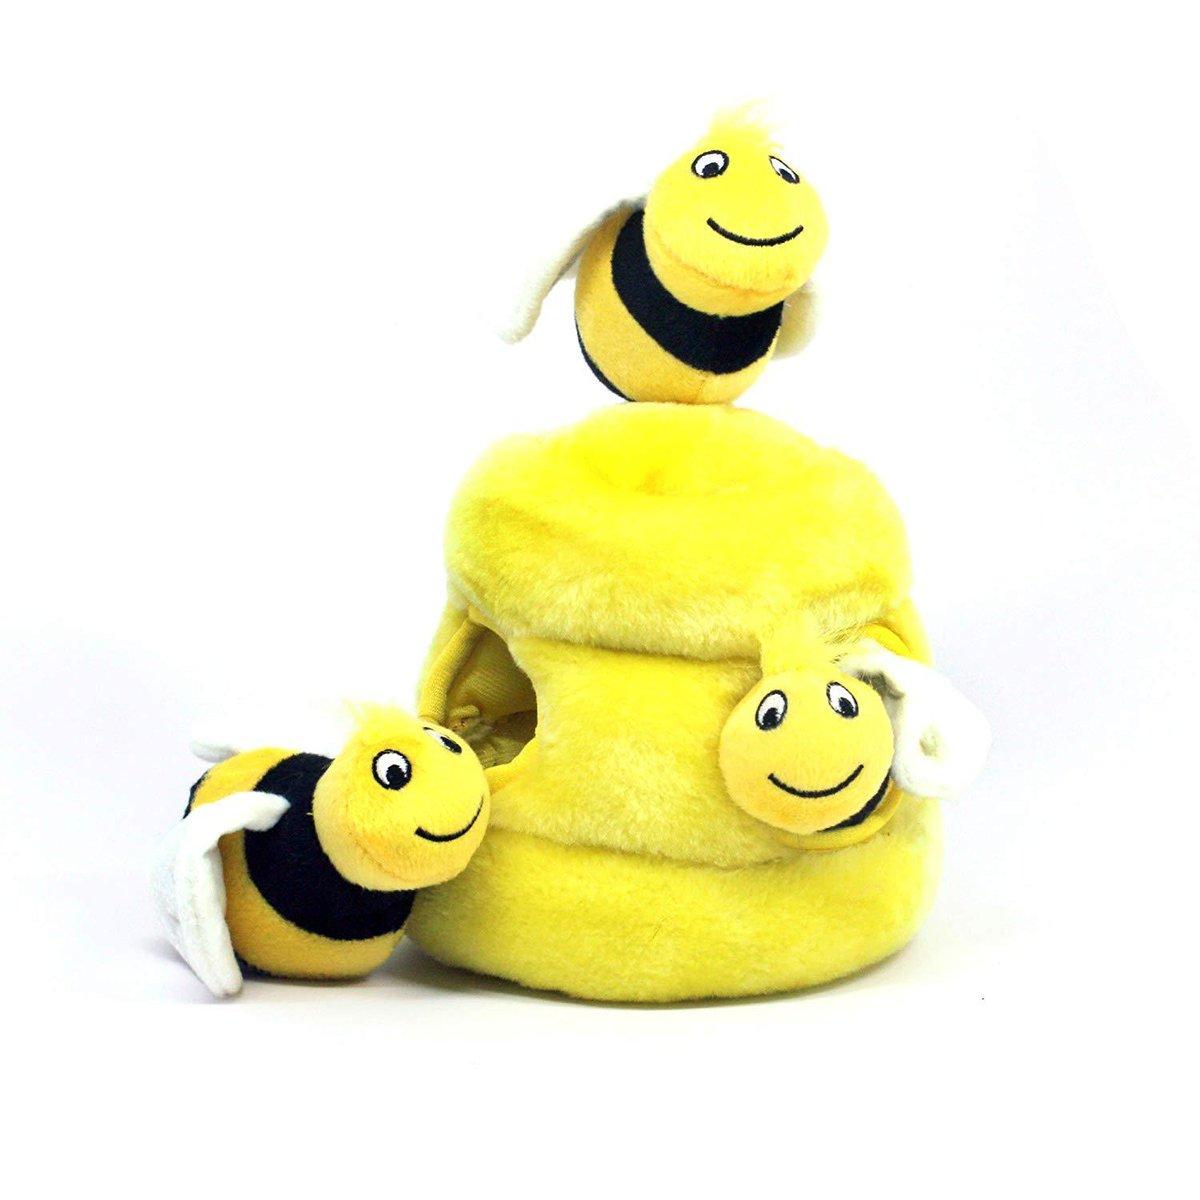 ***New Deal*** Outward Hound Hide-A-Bee Inter... New price $5.90 https://www.amazon.com/Interactive-Puzzle-Plush-Outward-Hound/dp/B0002I0O5Q?&tag=vglnkc8152-20… #Deals #newDeals #Discountspic.twitter.com/ewr4yxrcaN